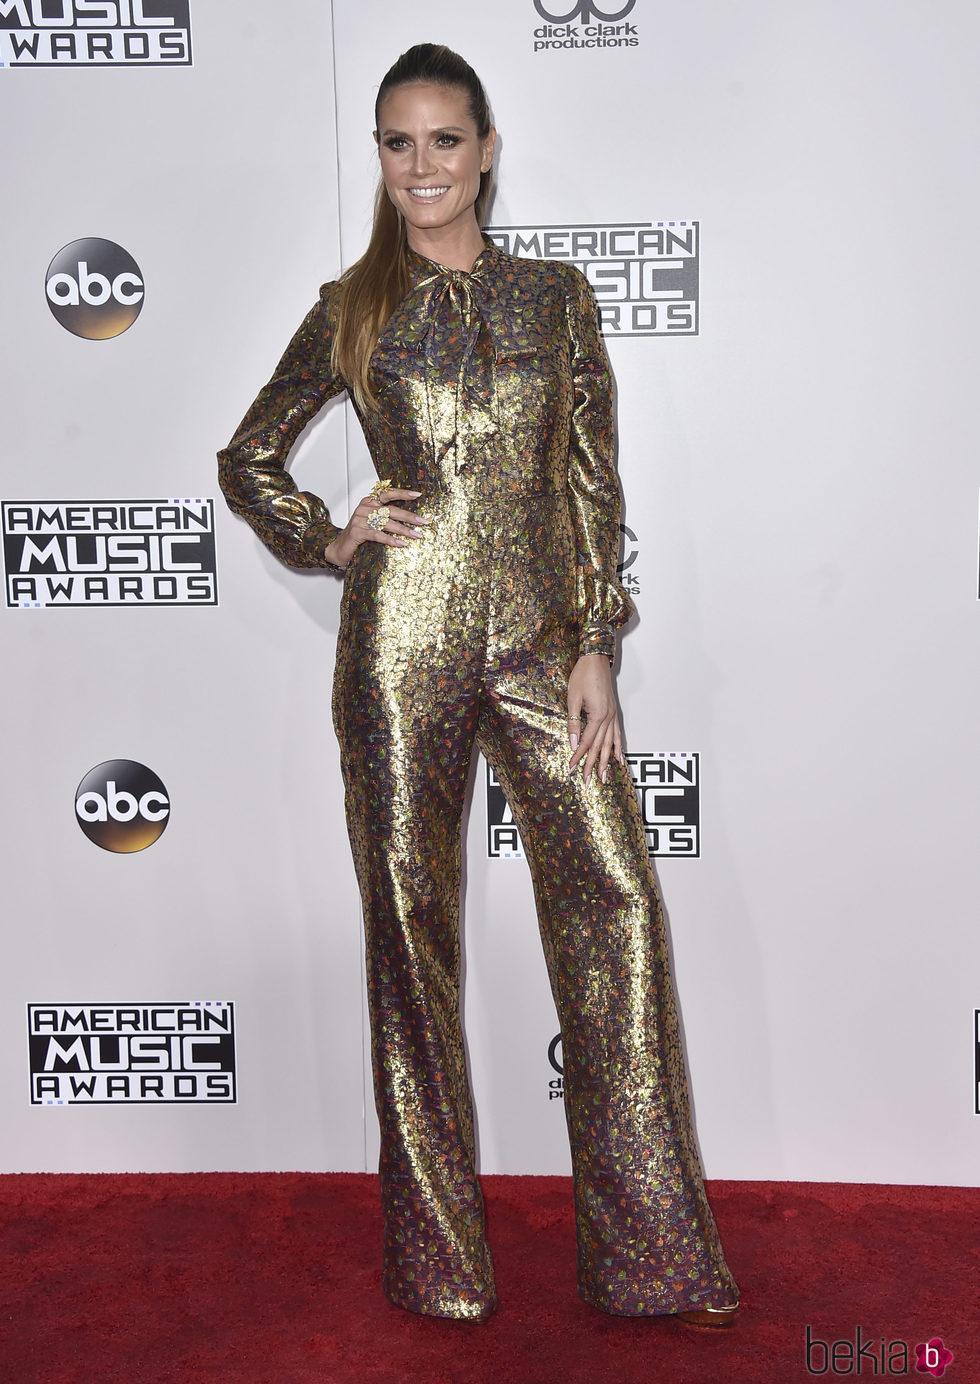 Heidi Klum en los American Music Awards 2016